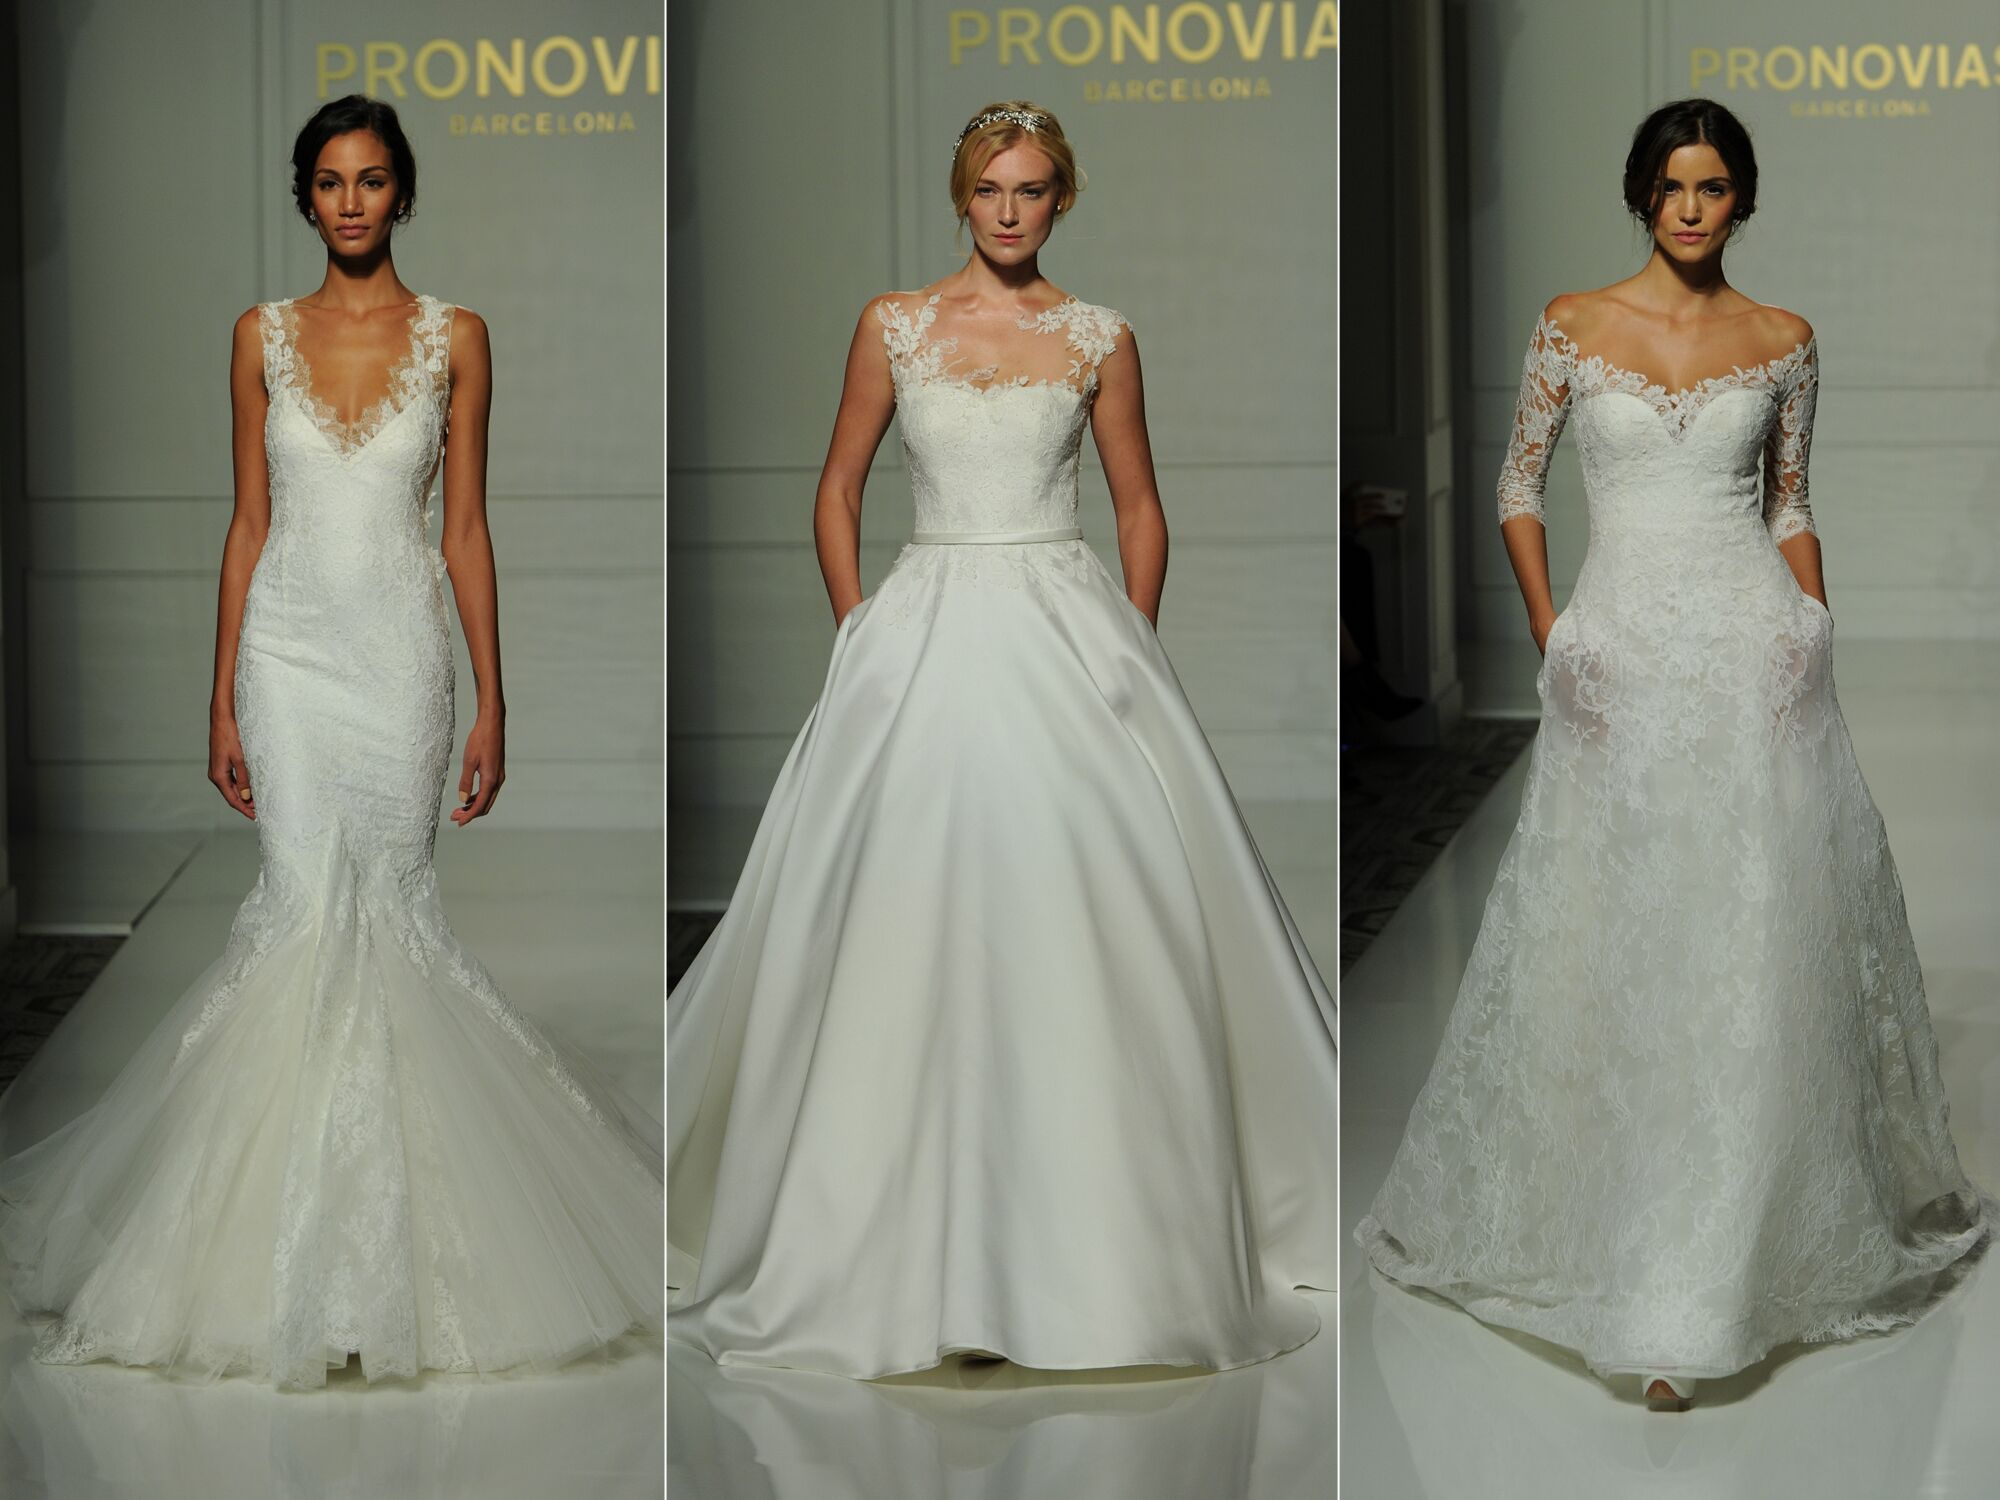 Wedding Gowns 2016: Pronovias Fall 2016 Collection: Wedding Dress Photos